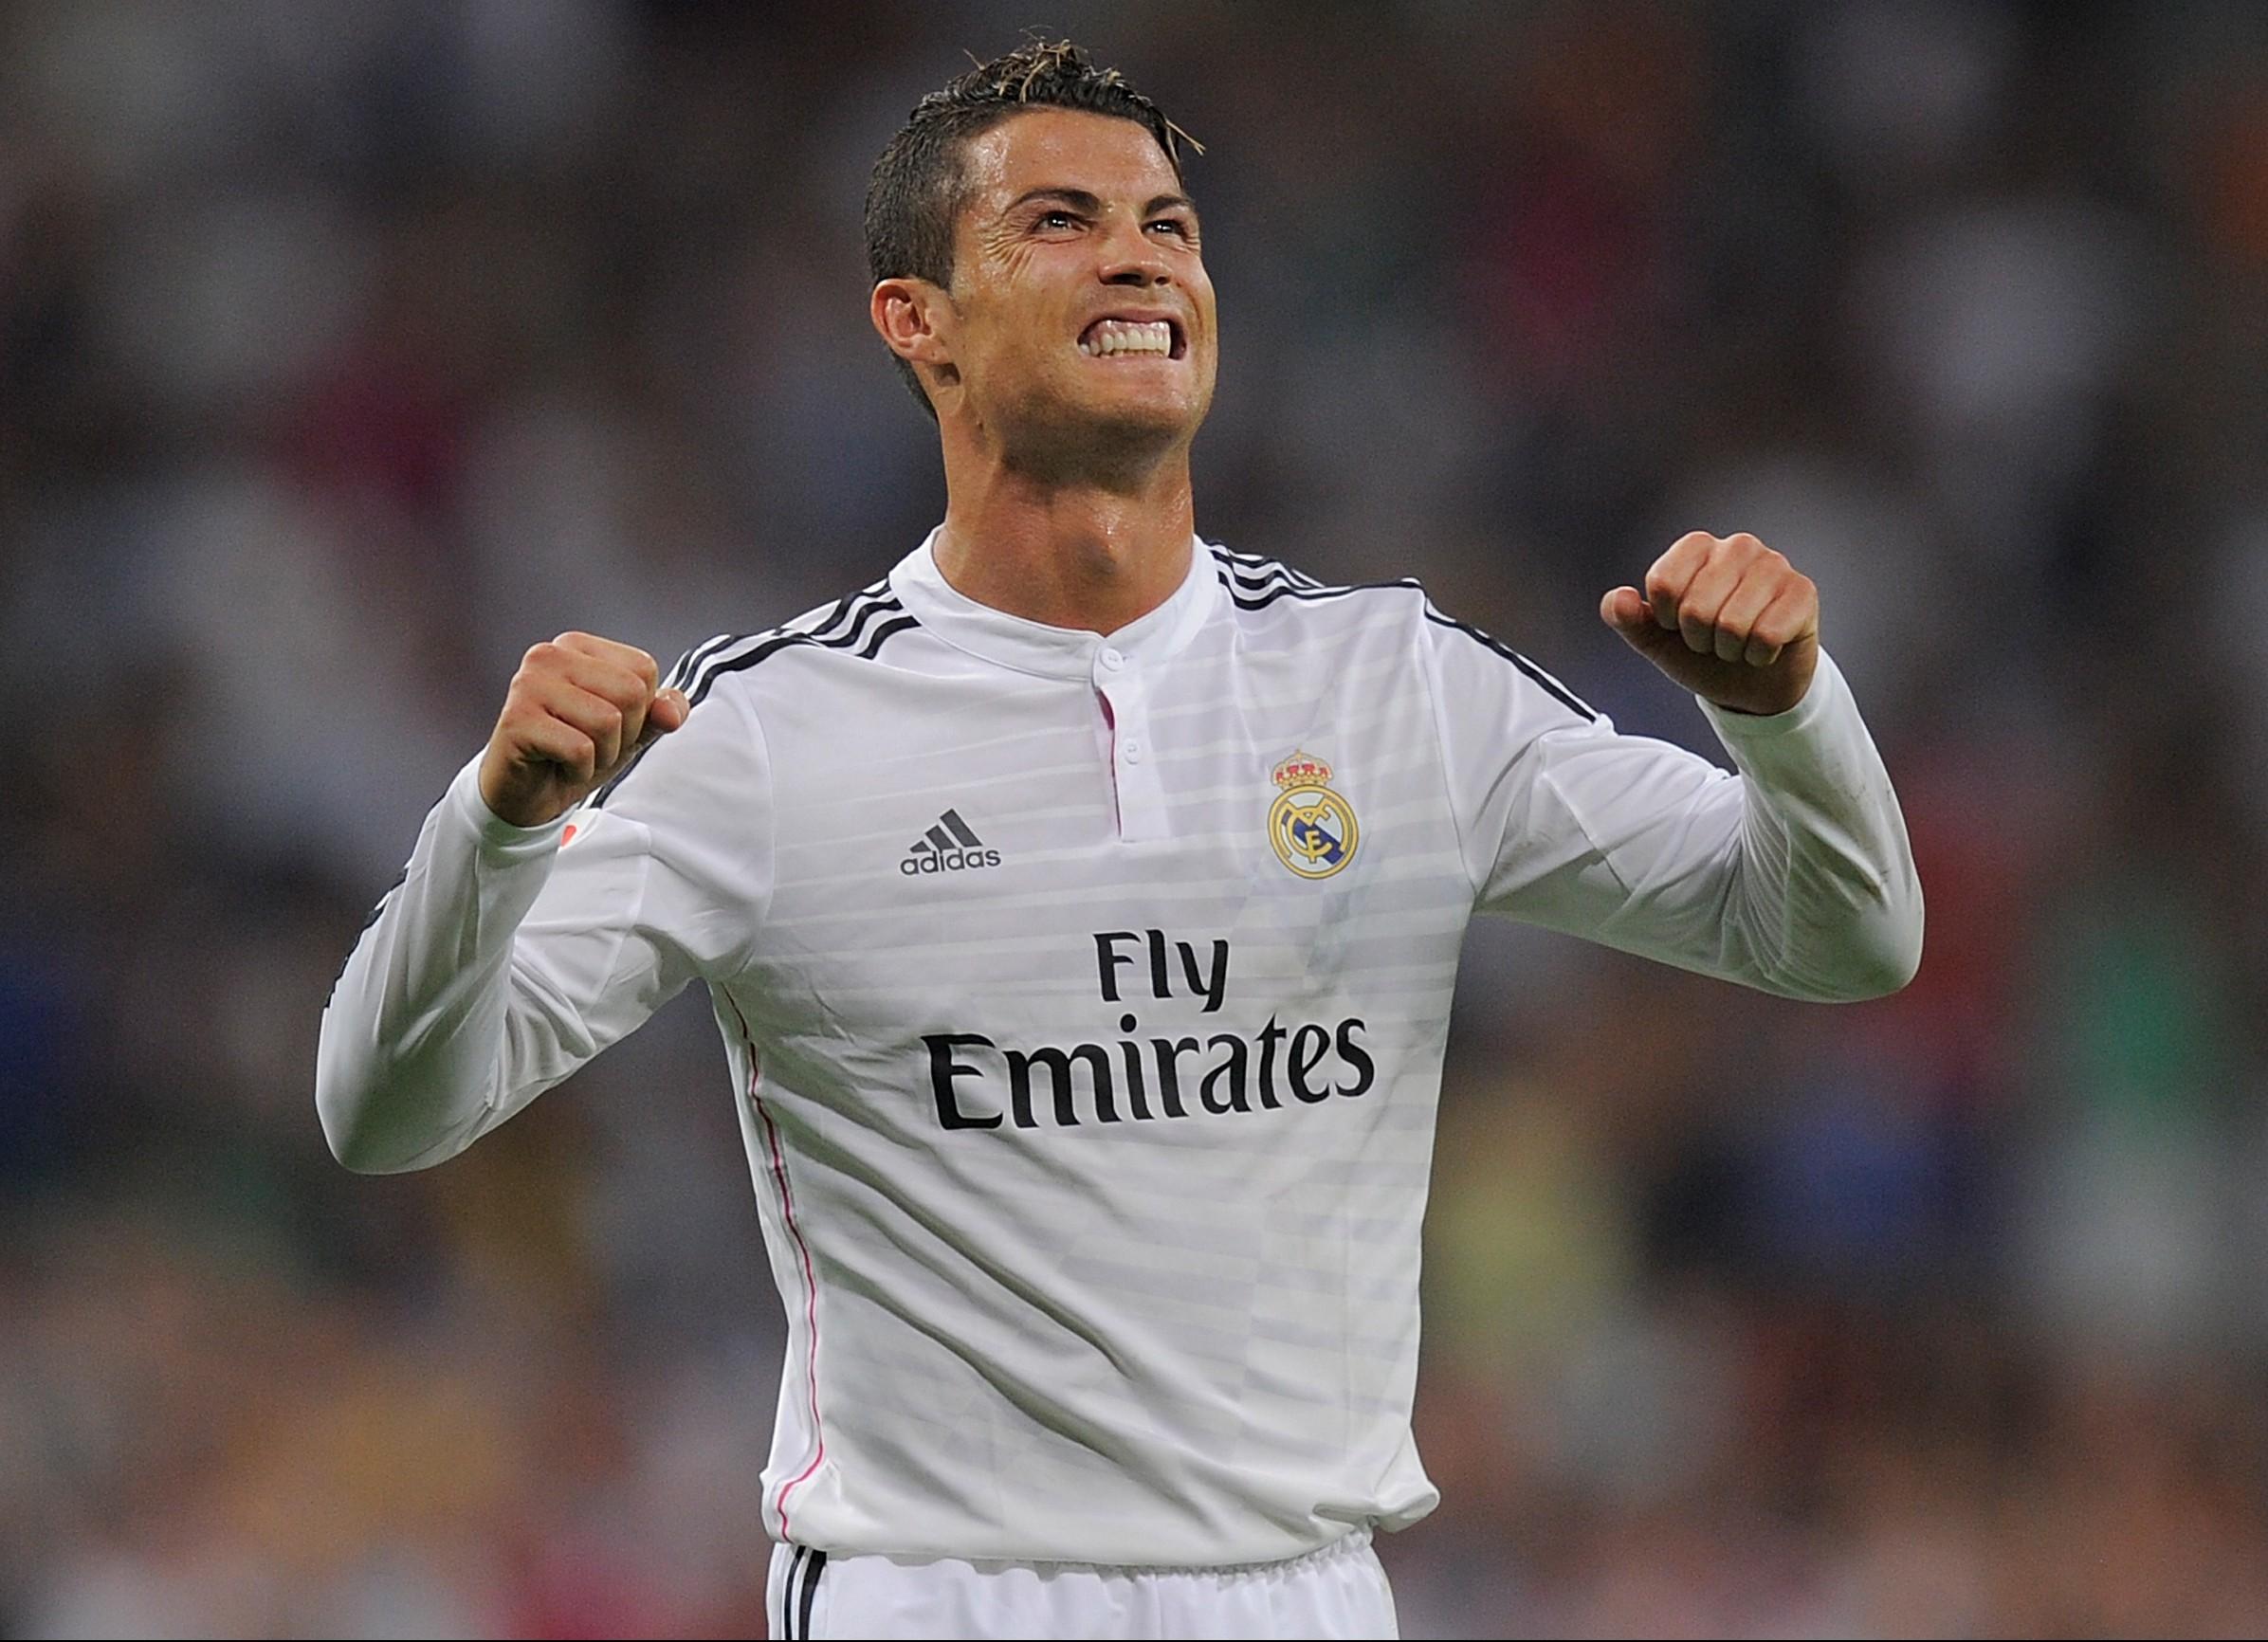 Real Madrid's Cristiano Ronaldo 'donates £5m to help Nepal after earthquake'